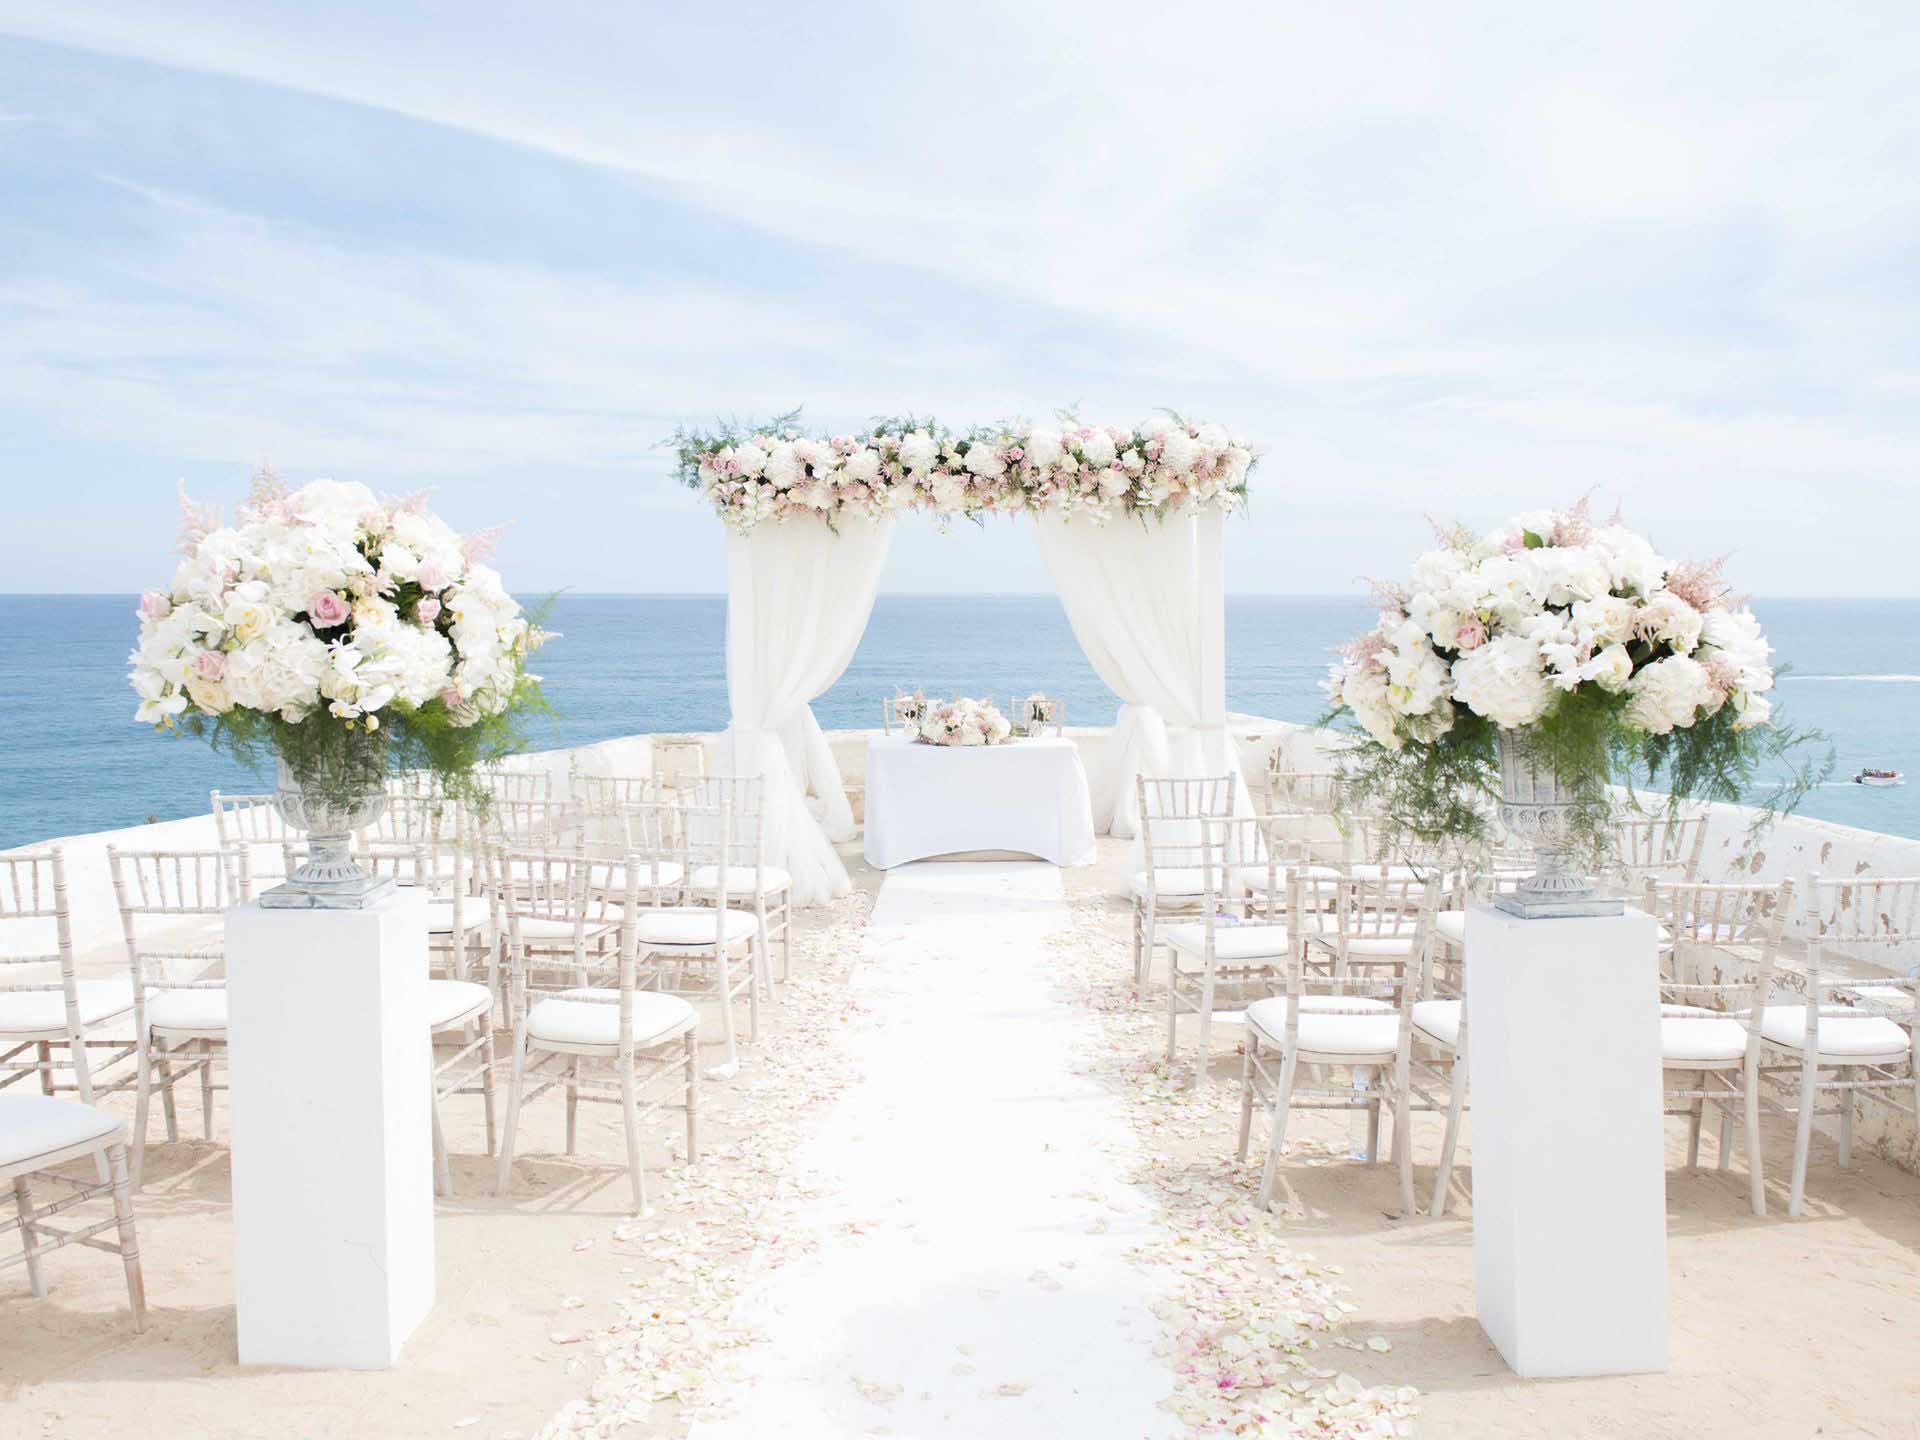 Wedding Planning: Rebecca Woodhall Wedding Planner, Designer And Coordinator